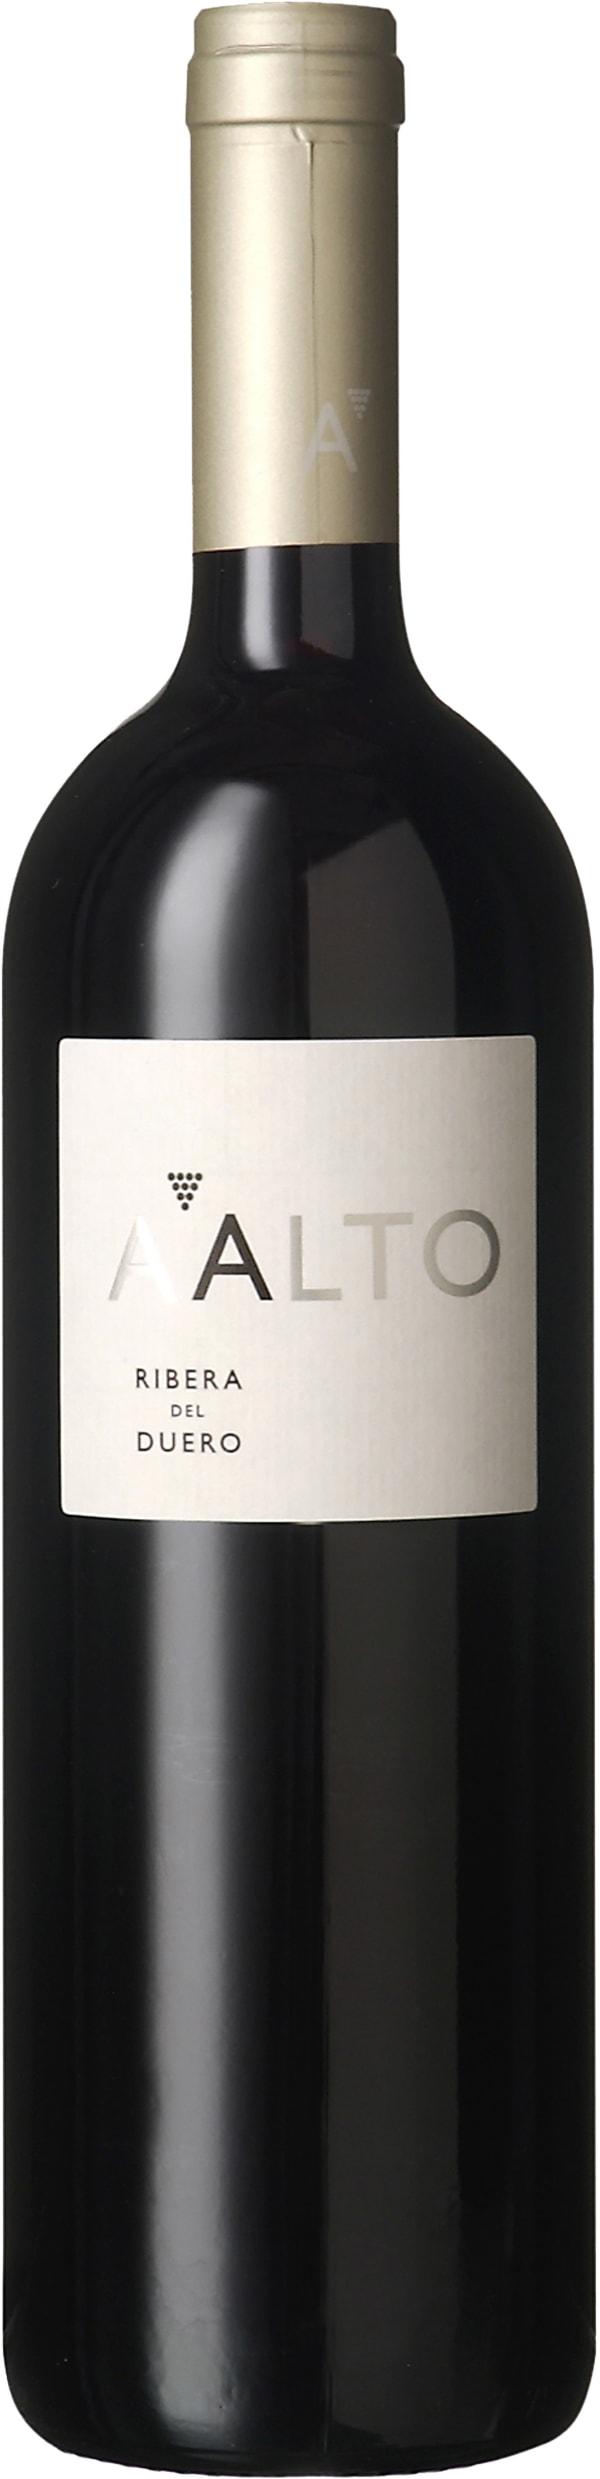 Aalto 2015